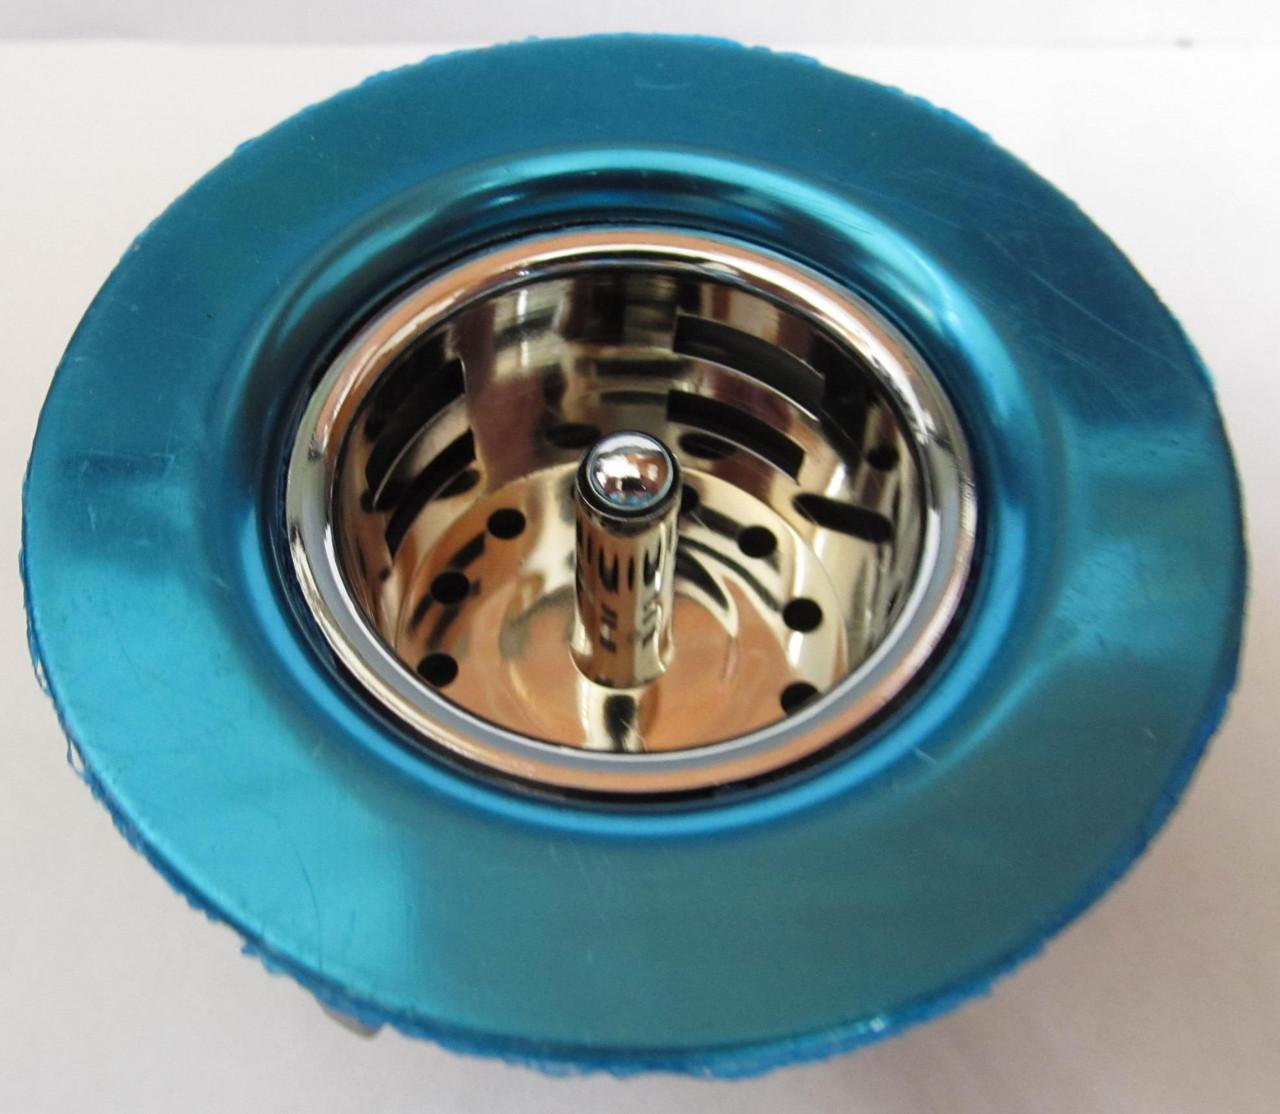 Sink Basket & Strainer (10-3010)